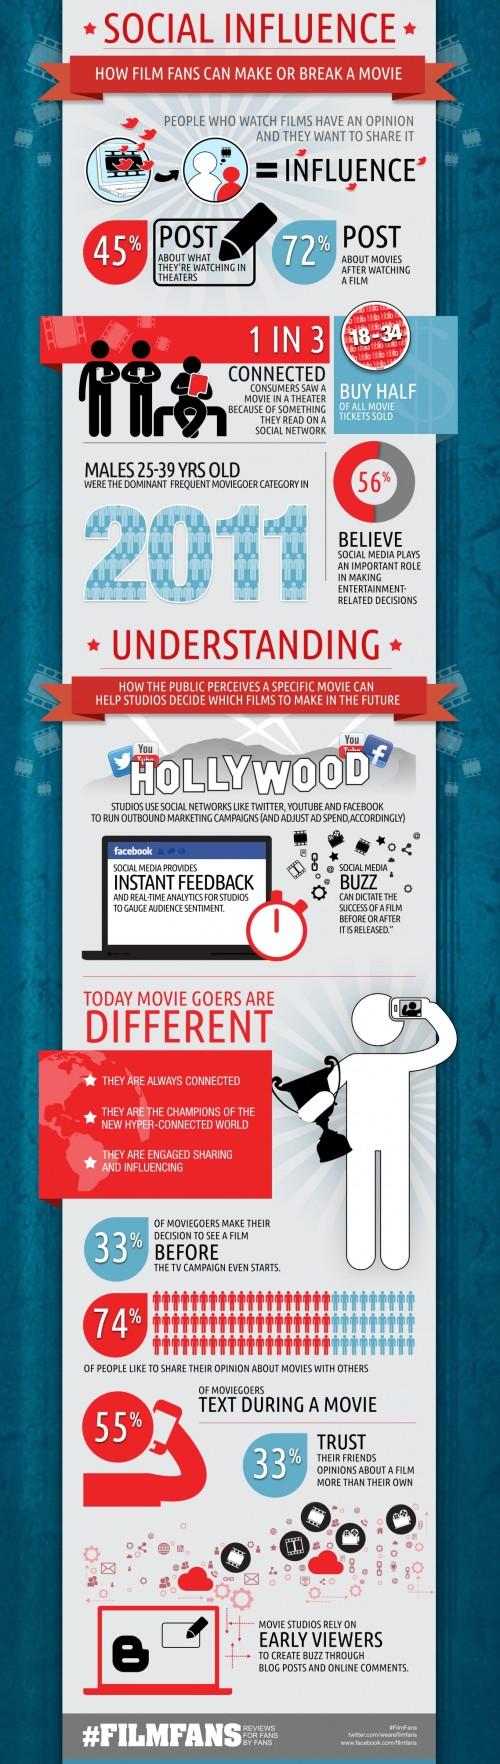 how-social-media-makes-or-breaks-a-move_50e622371c206_w1138